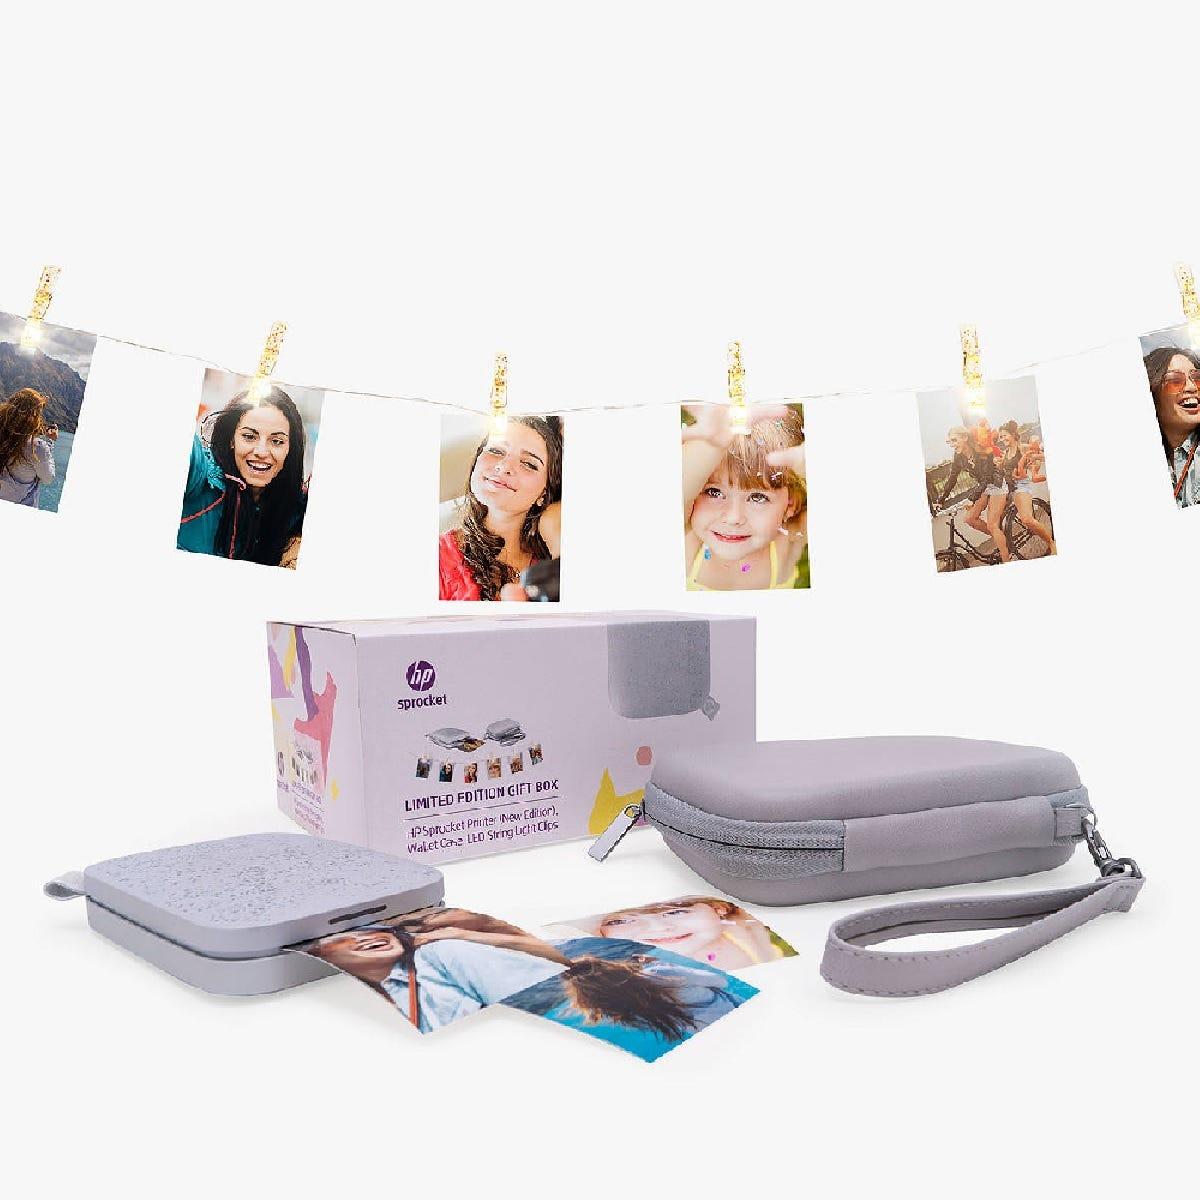 HP Sprocket 200 Portable Photo Printer Gift Box